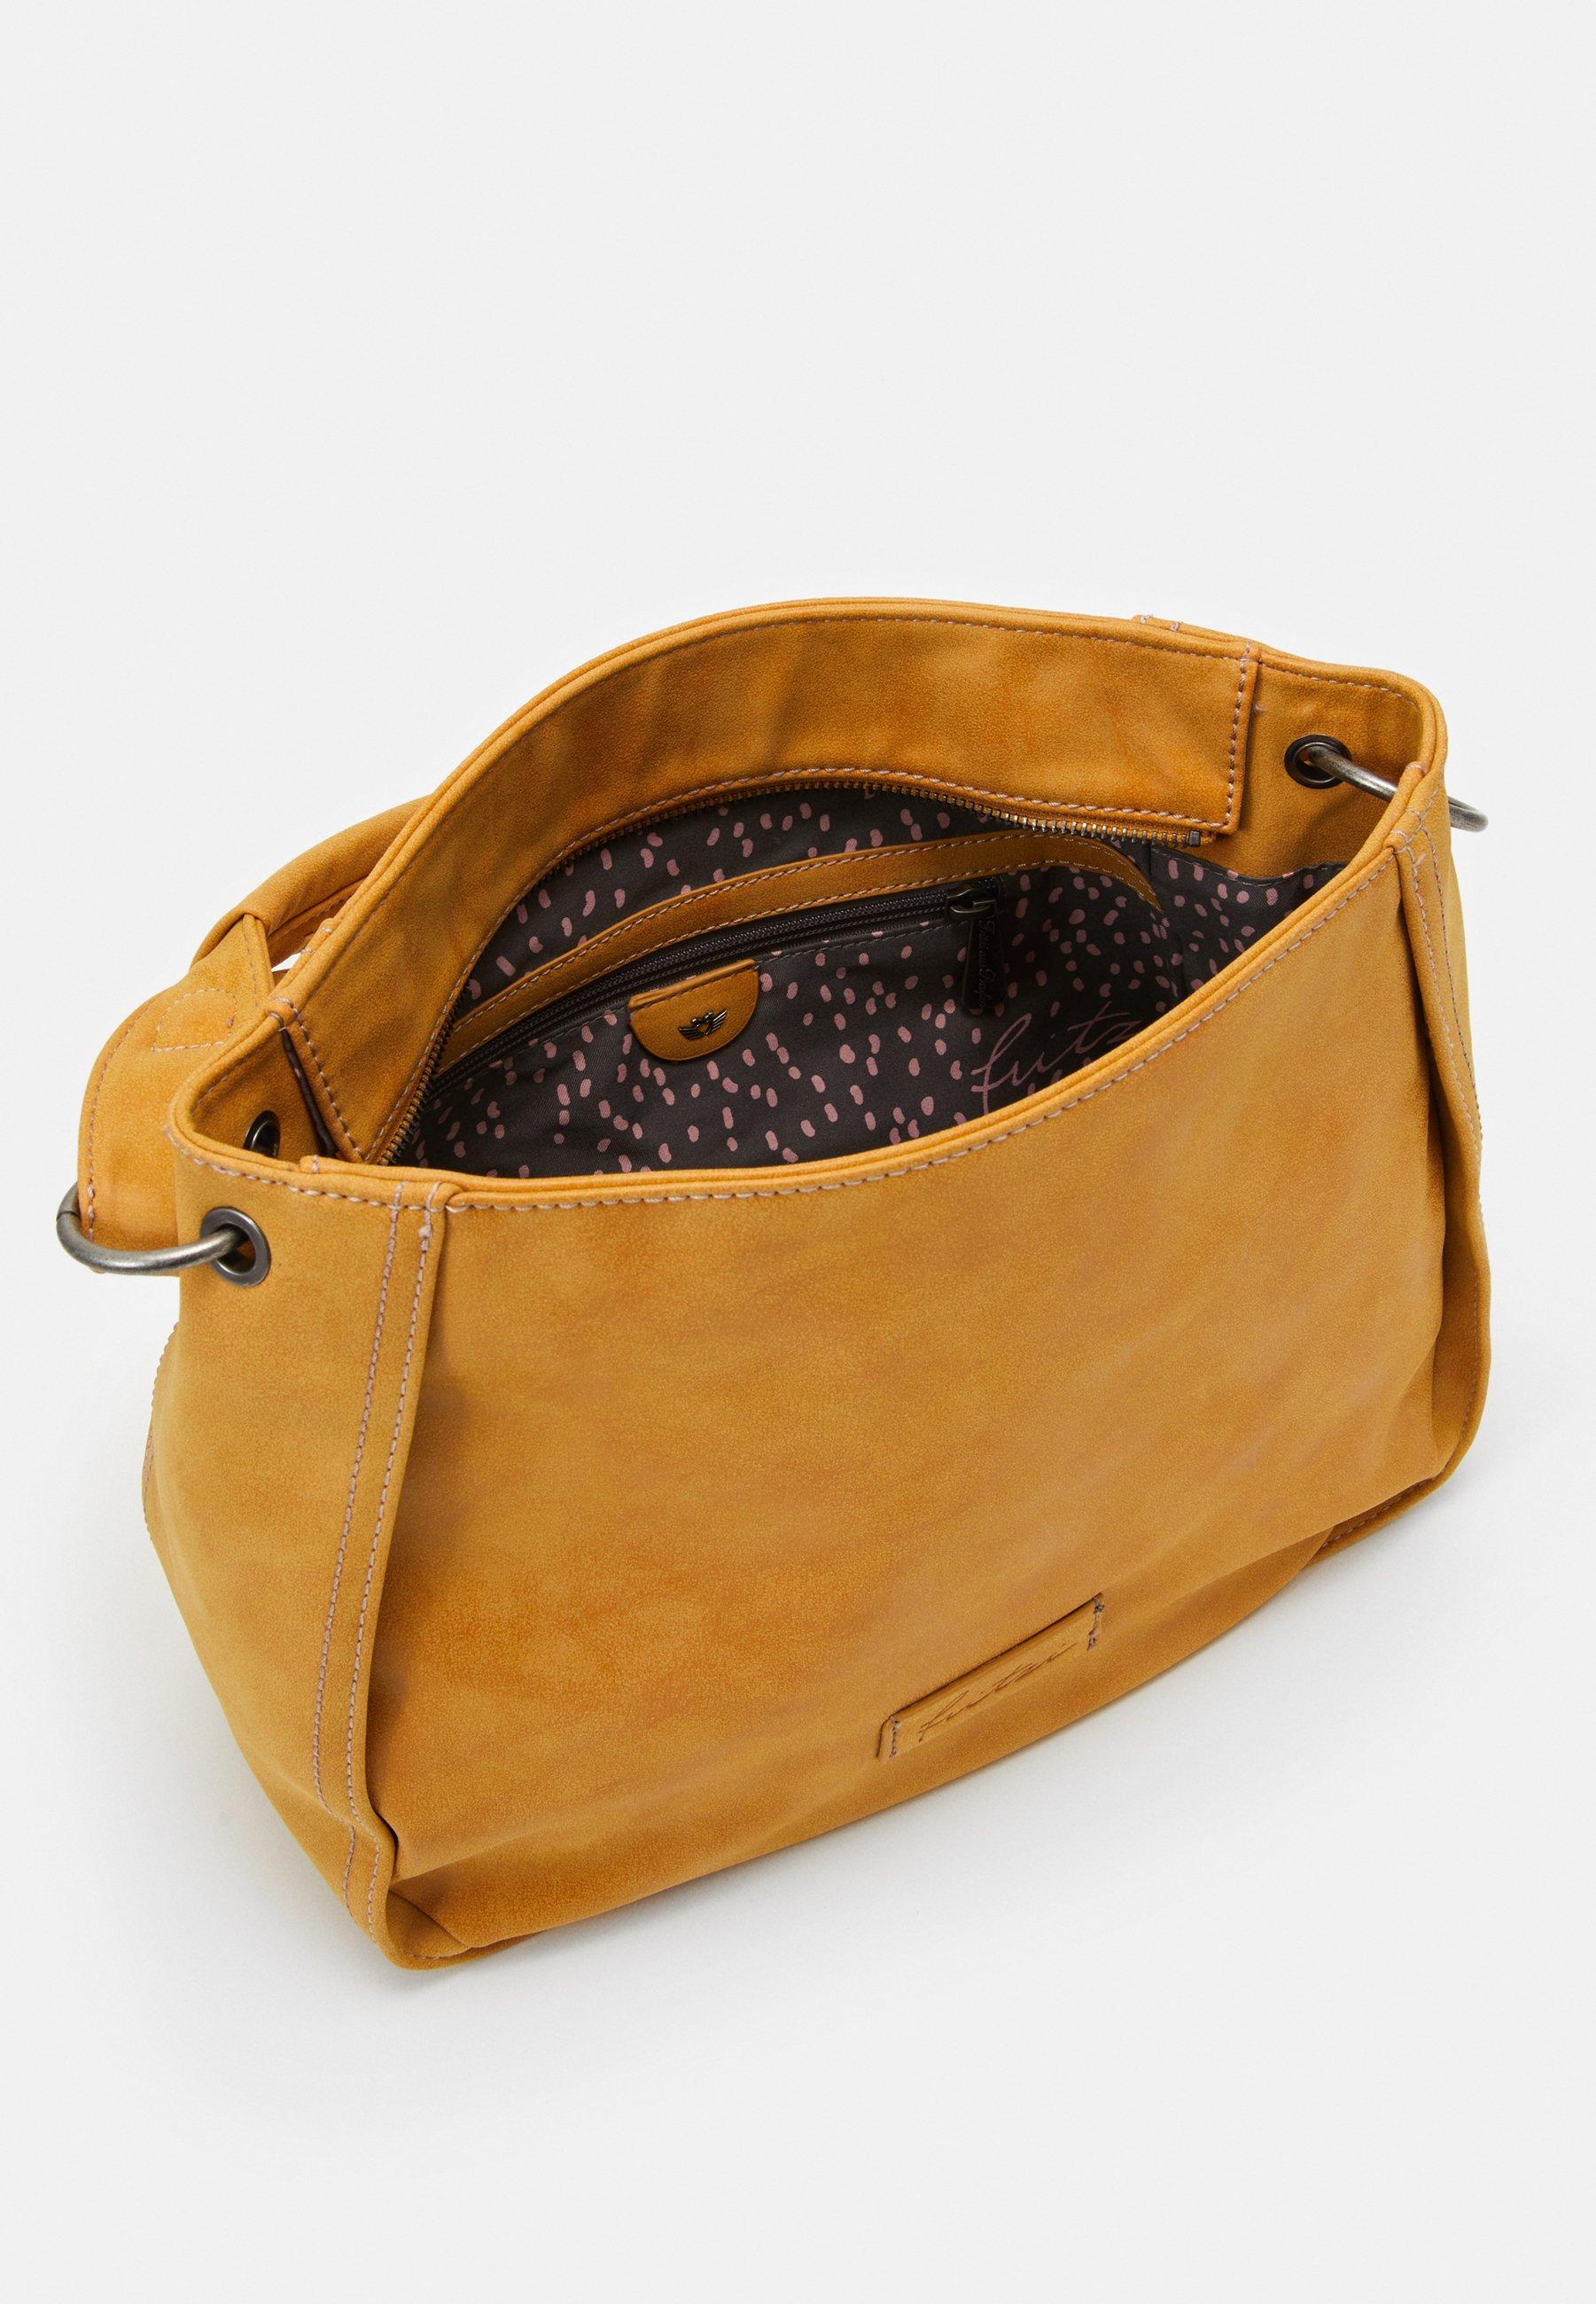 Cheapest Outlet Fritzi aus Preußen SET - Tote bag - honey mustard   women's accessories 2020 NFyzk